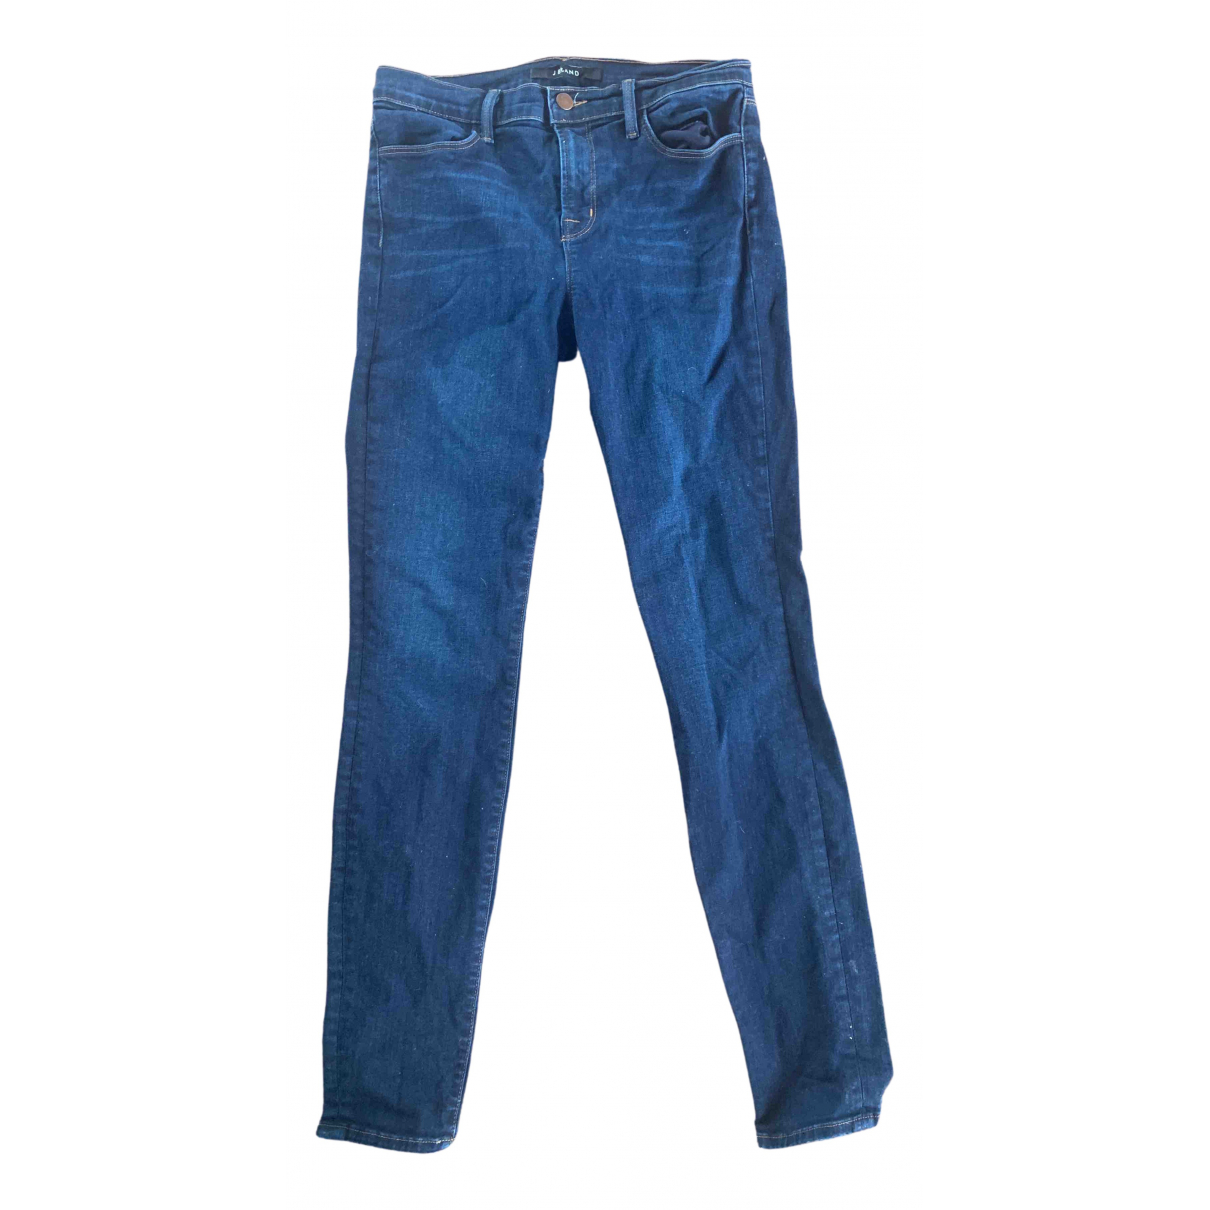 J Brand N Blue Denim - Jeans Jeans for Women 29 US